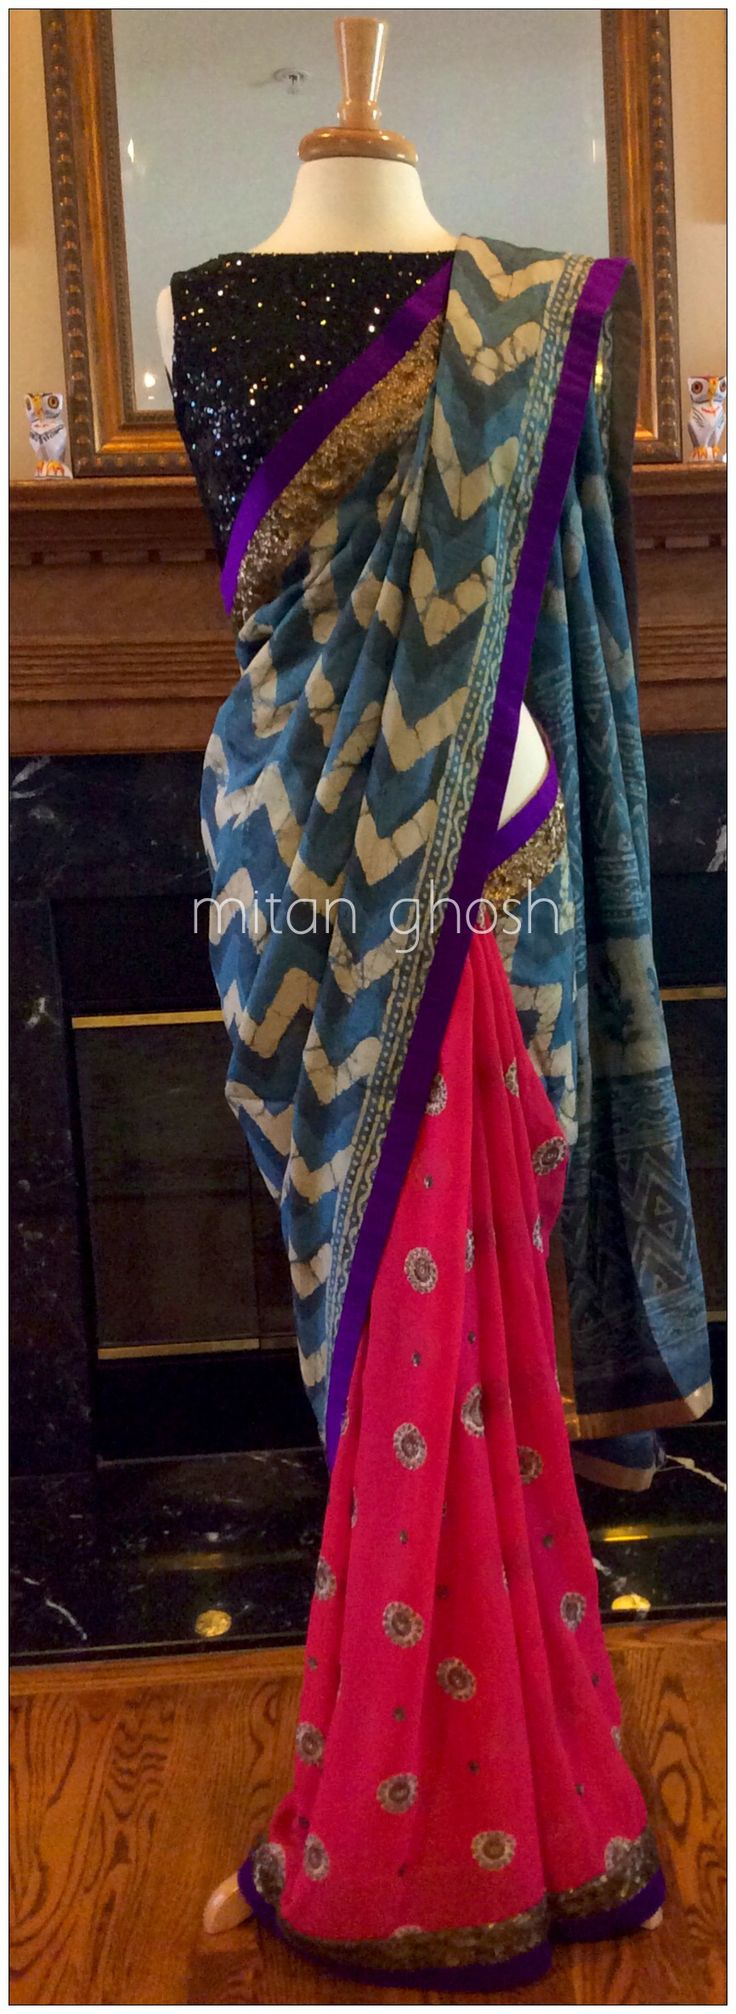 Batik tassar with georgette saree